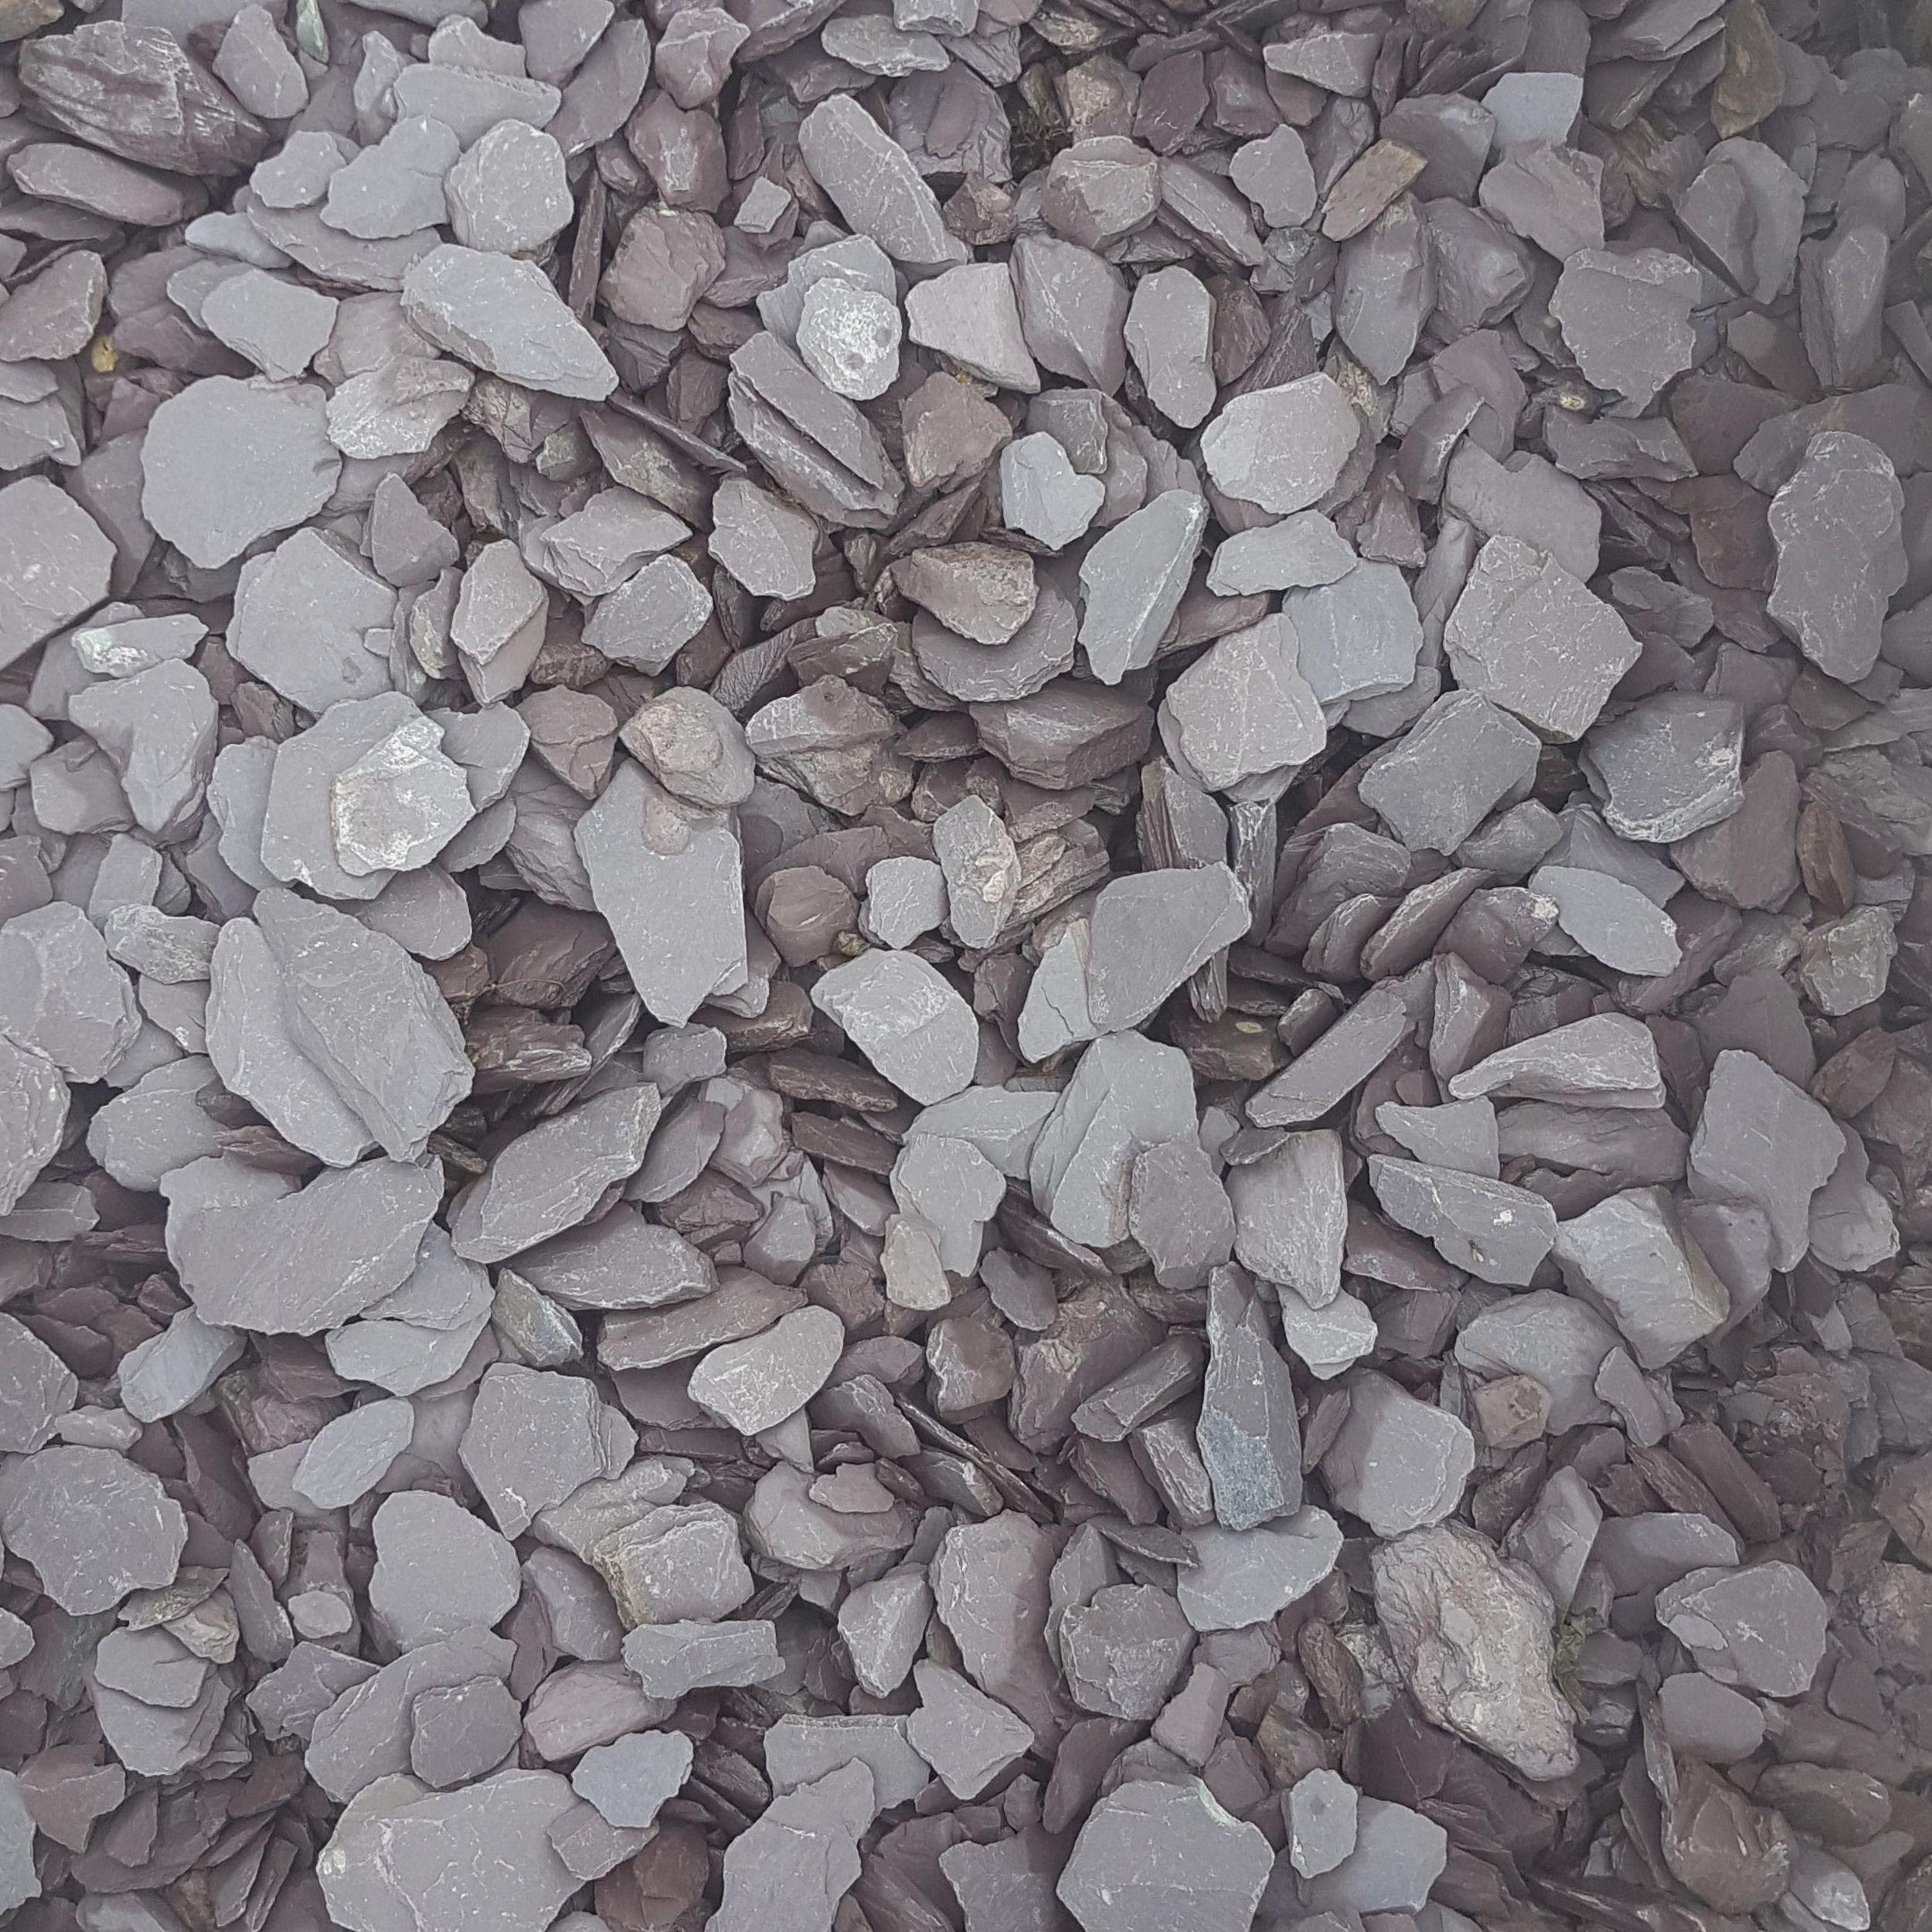 plum slate 40mm dry mitchell turf